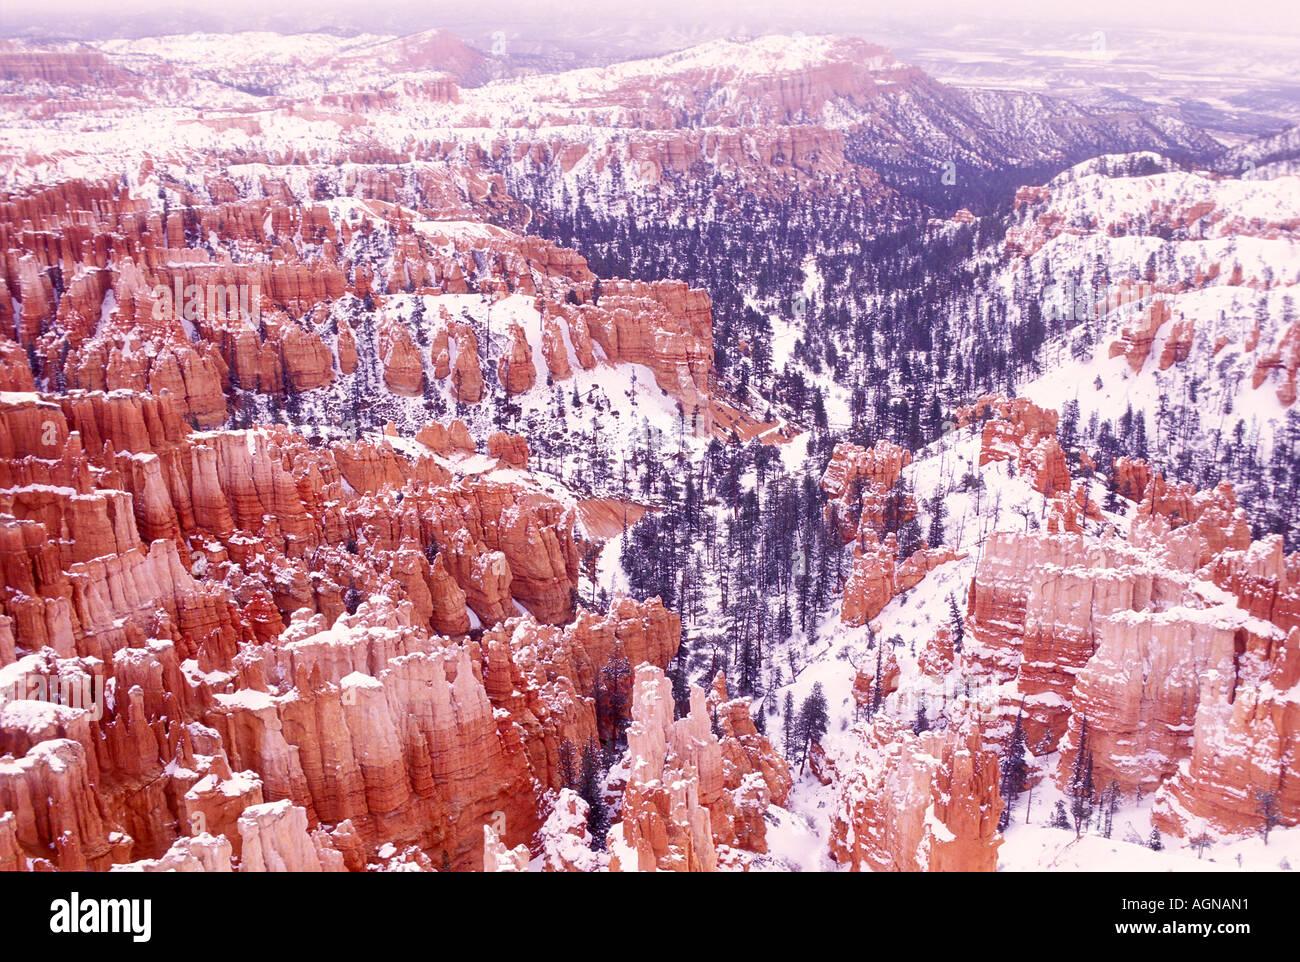 Bryce Canyon National Park Utah - Stock Image